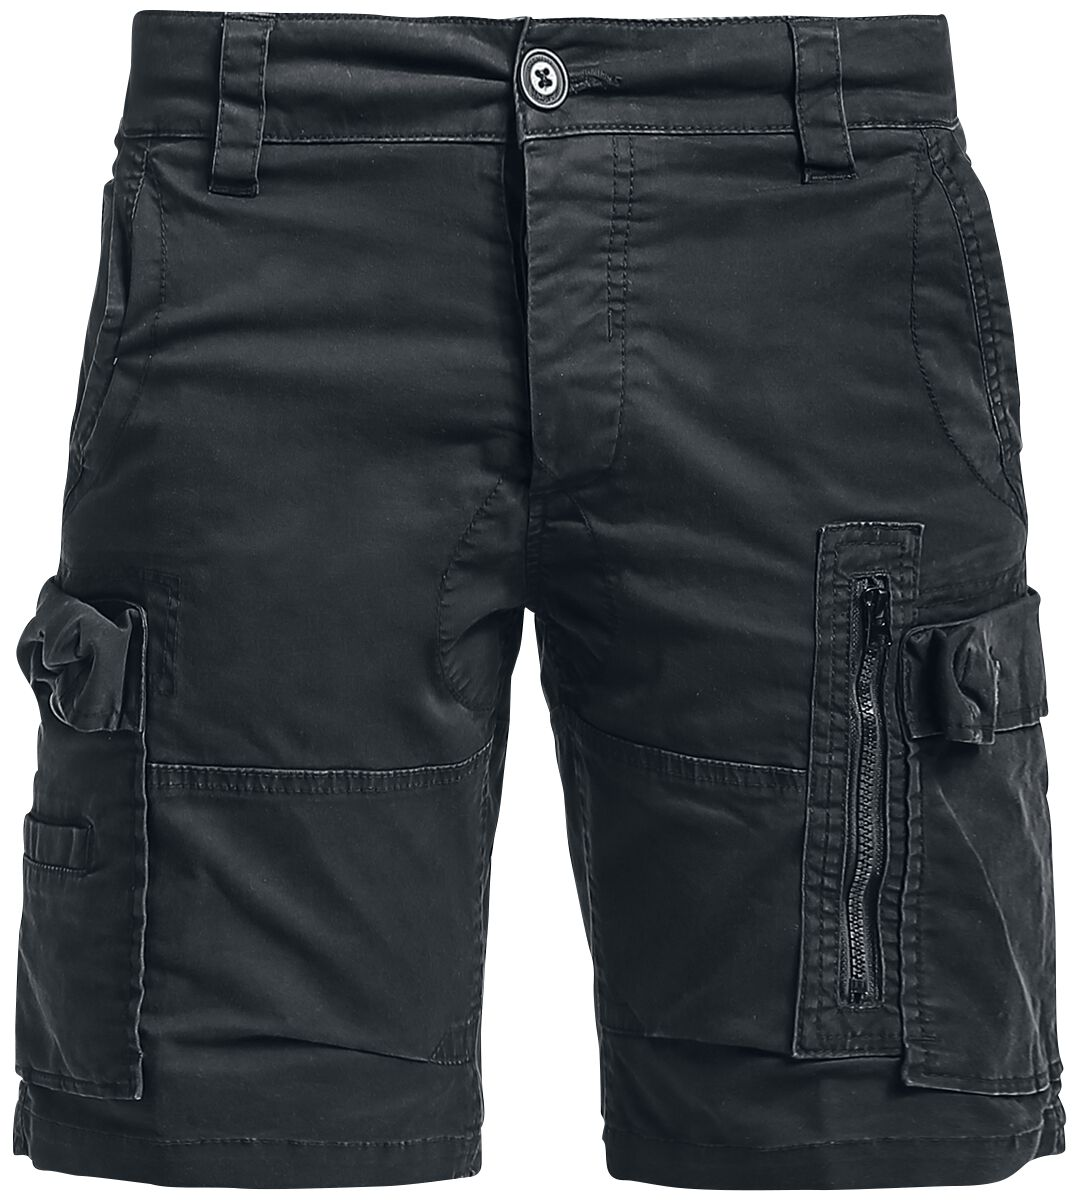 Image of   Brandit Kite Short Slim Fit Shorts sort